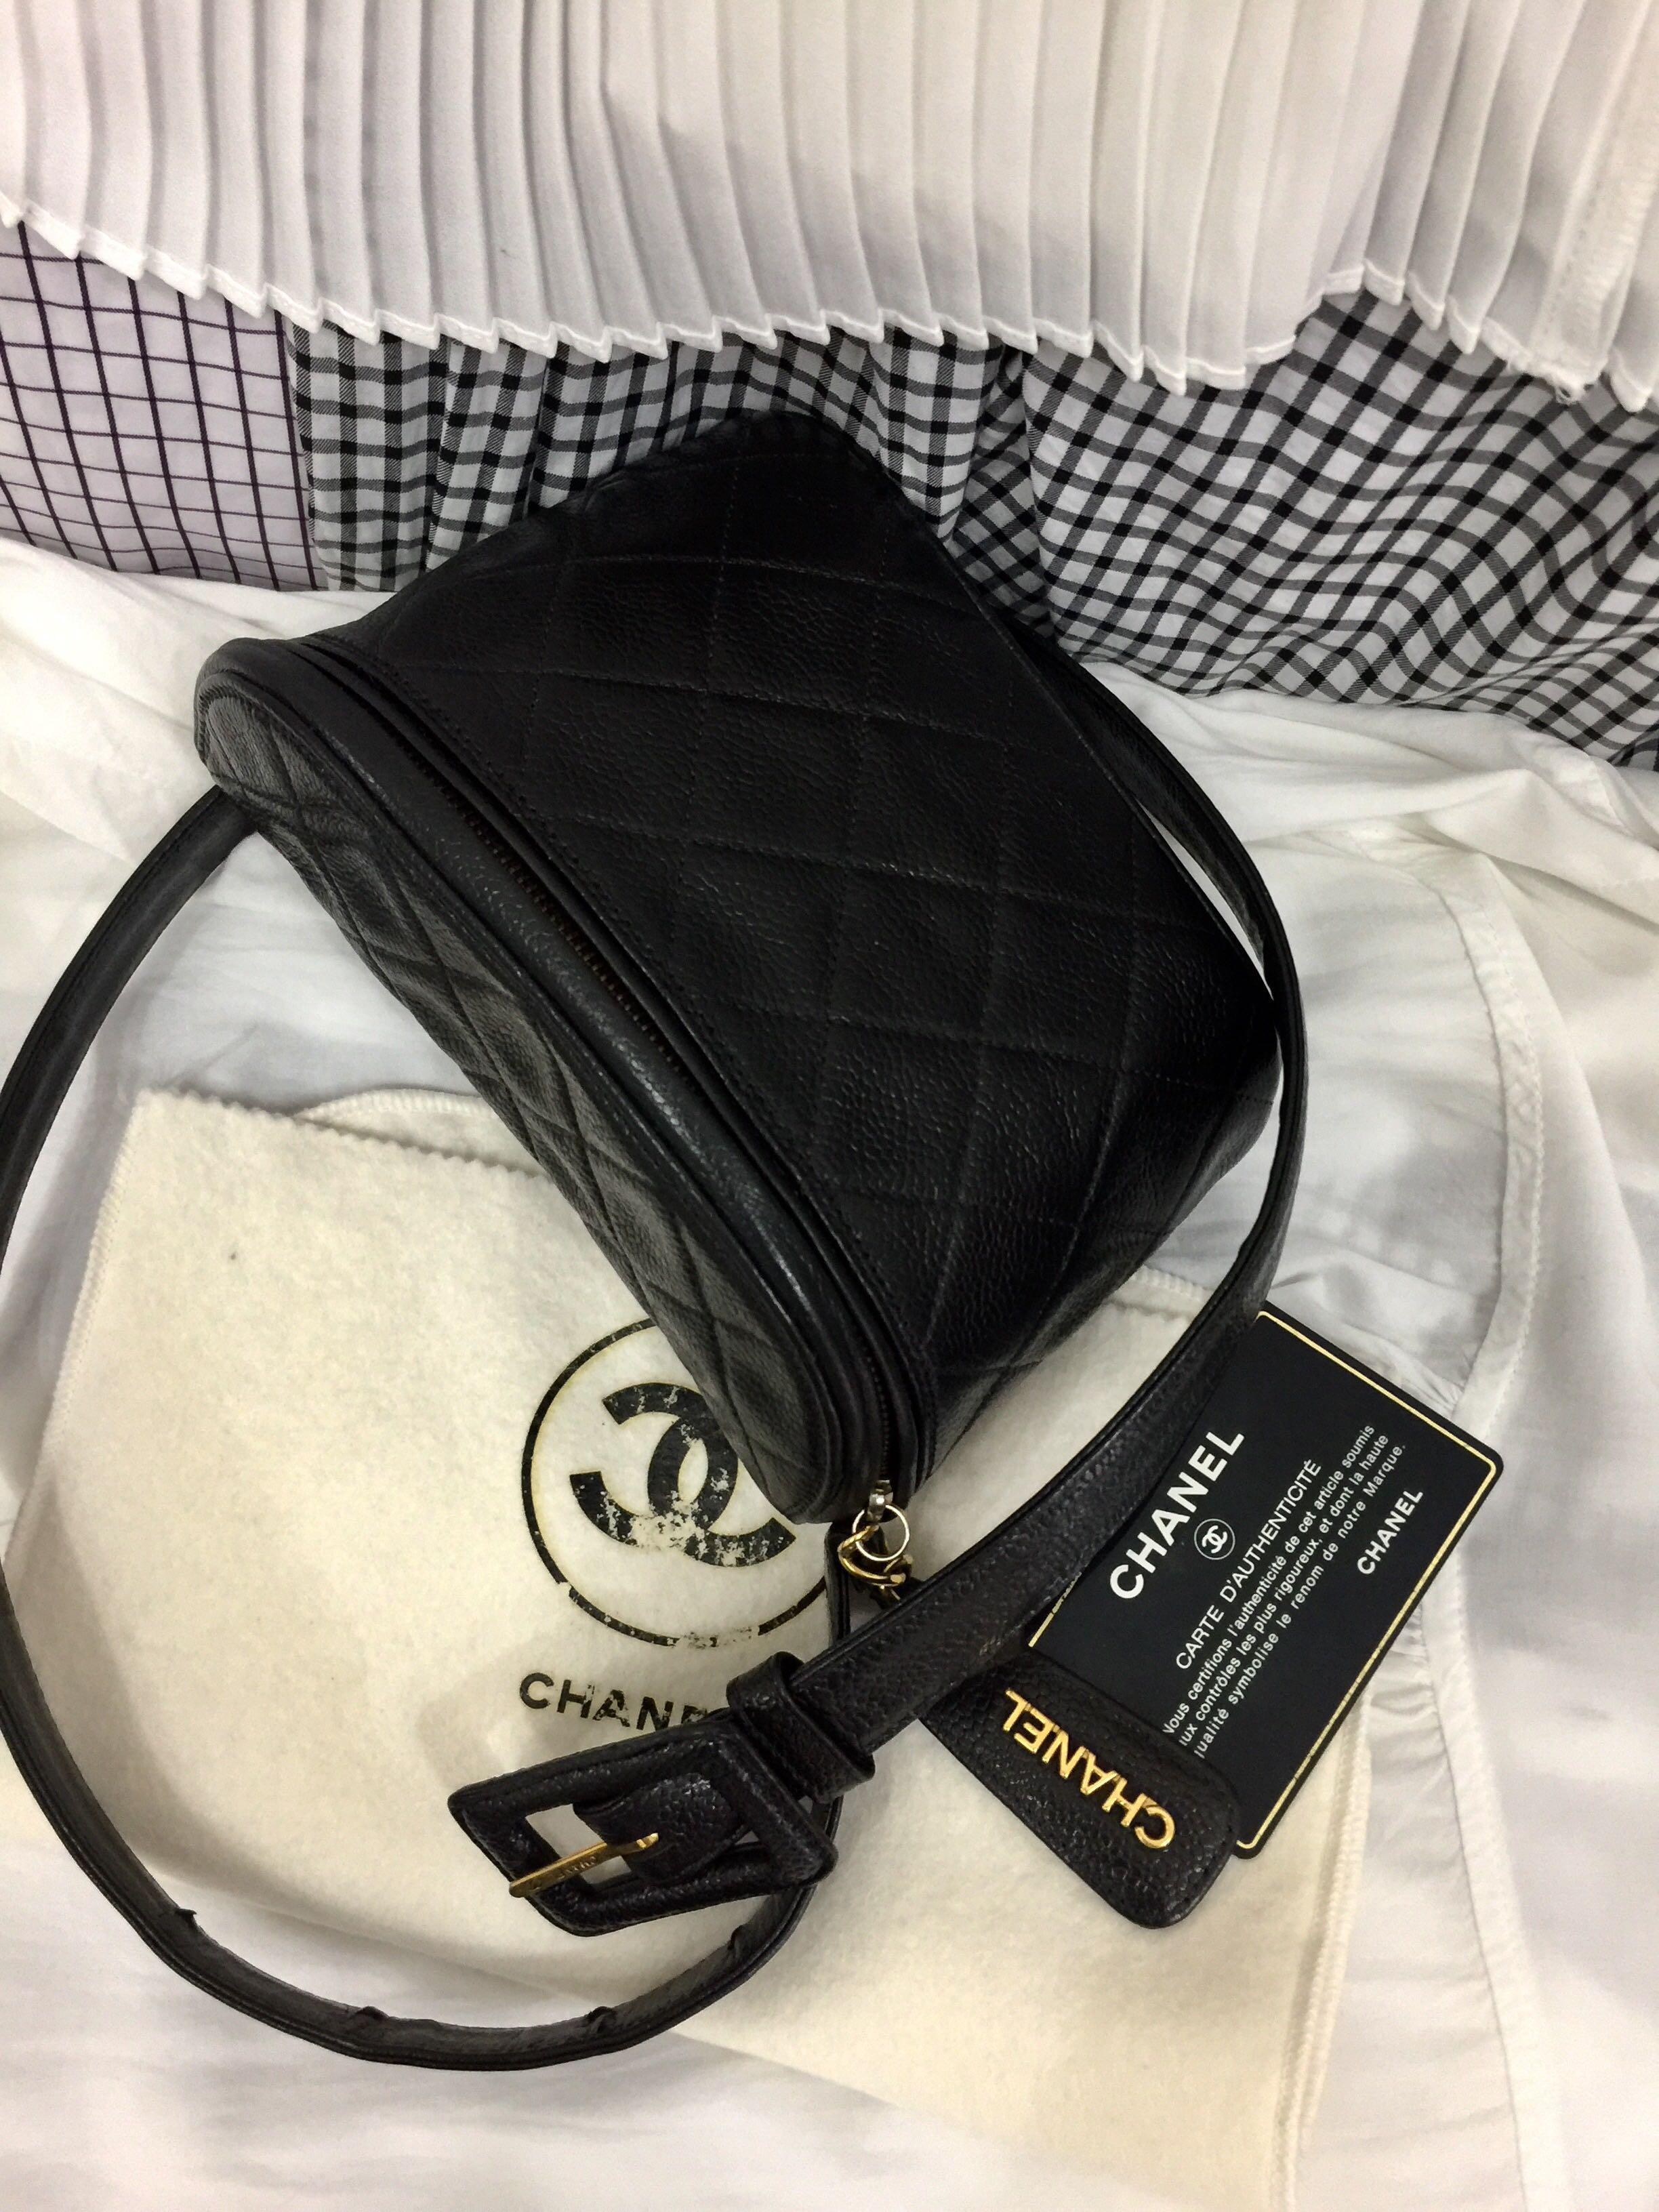 9625a258 Authentic chanel caviar vintage belt bag, Luxury, Bags & Wallets ...